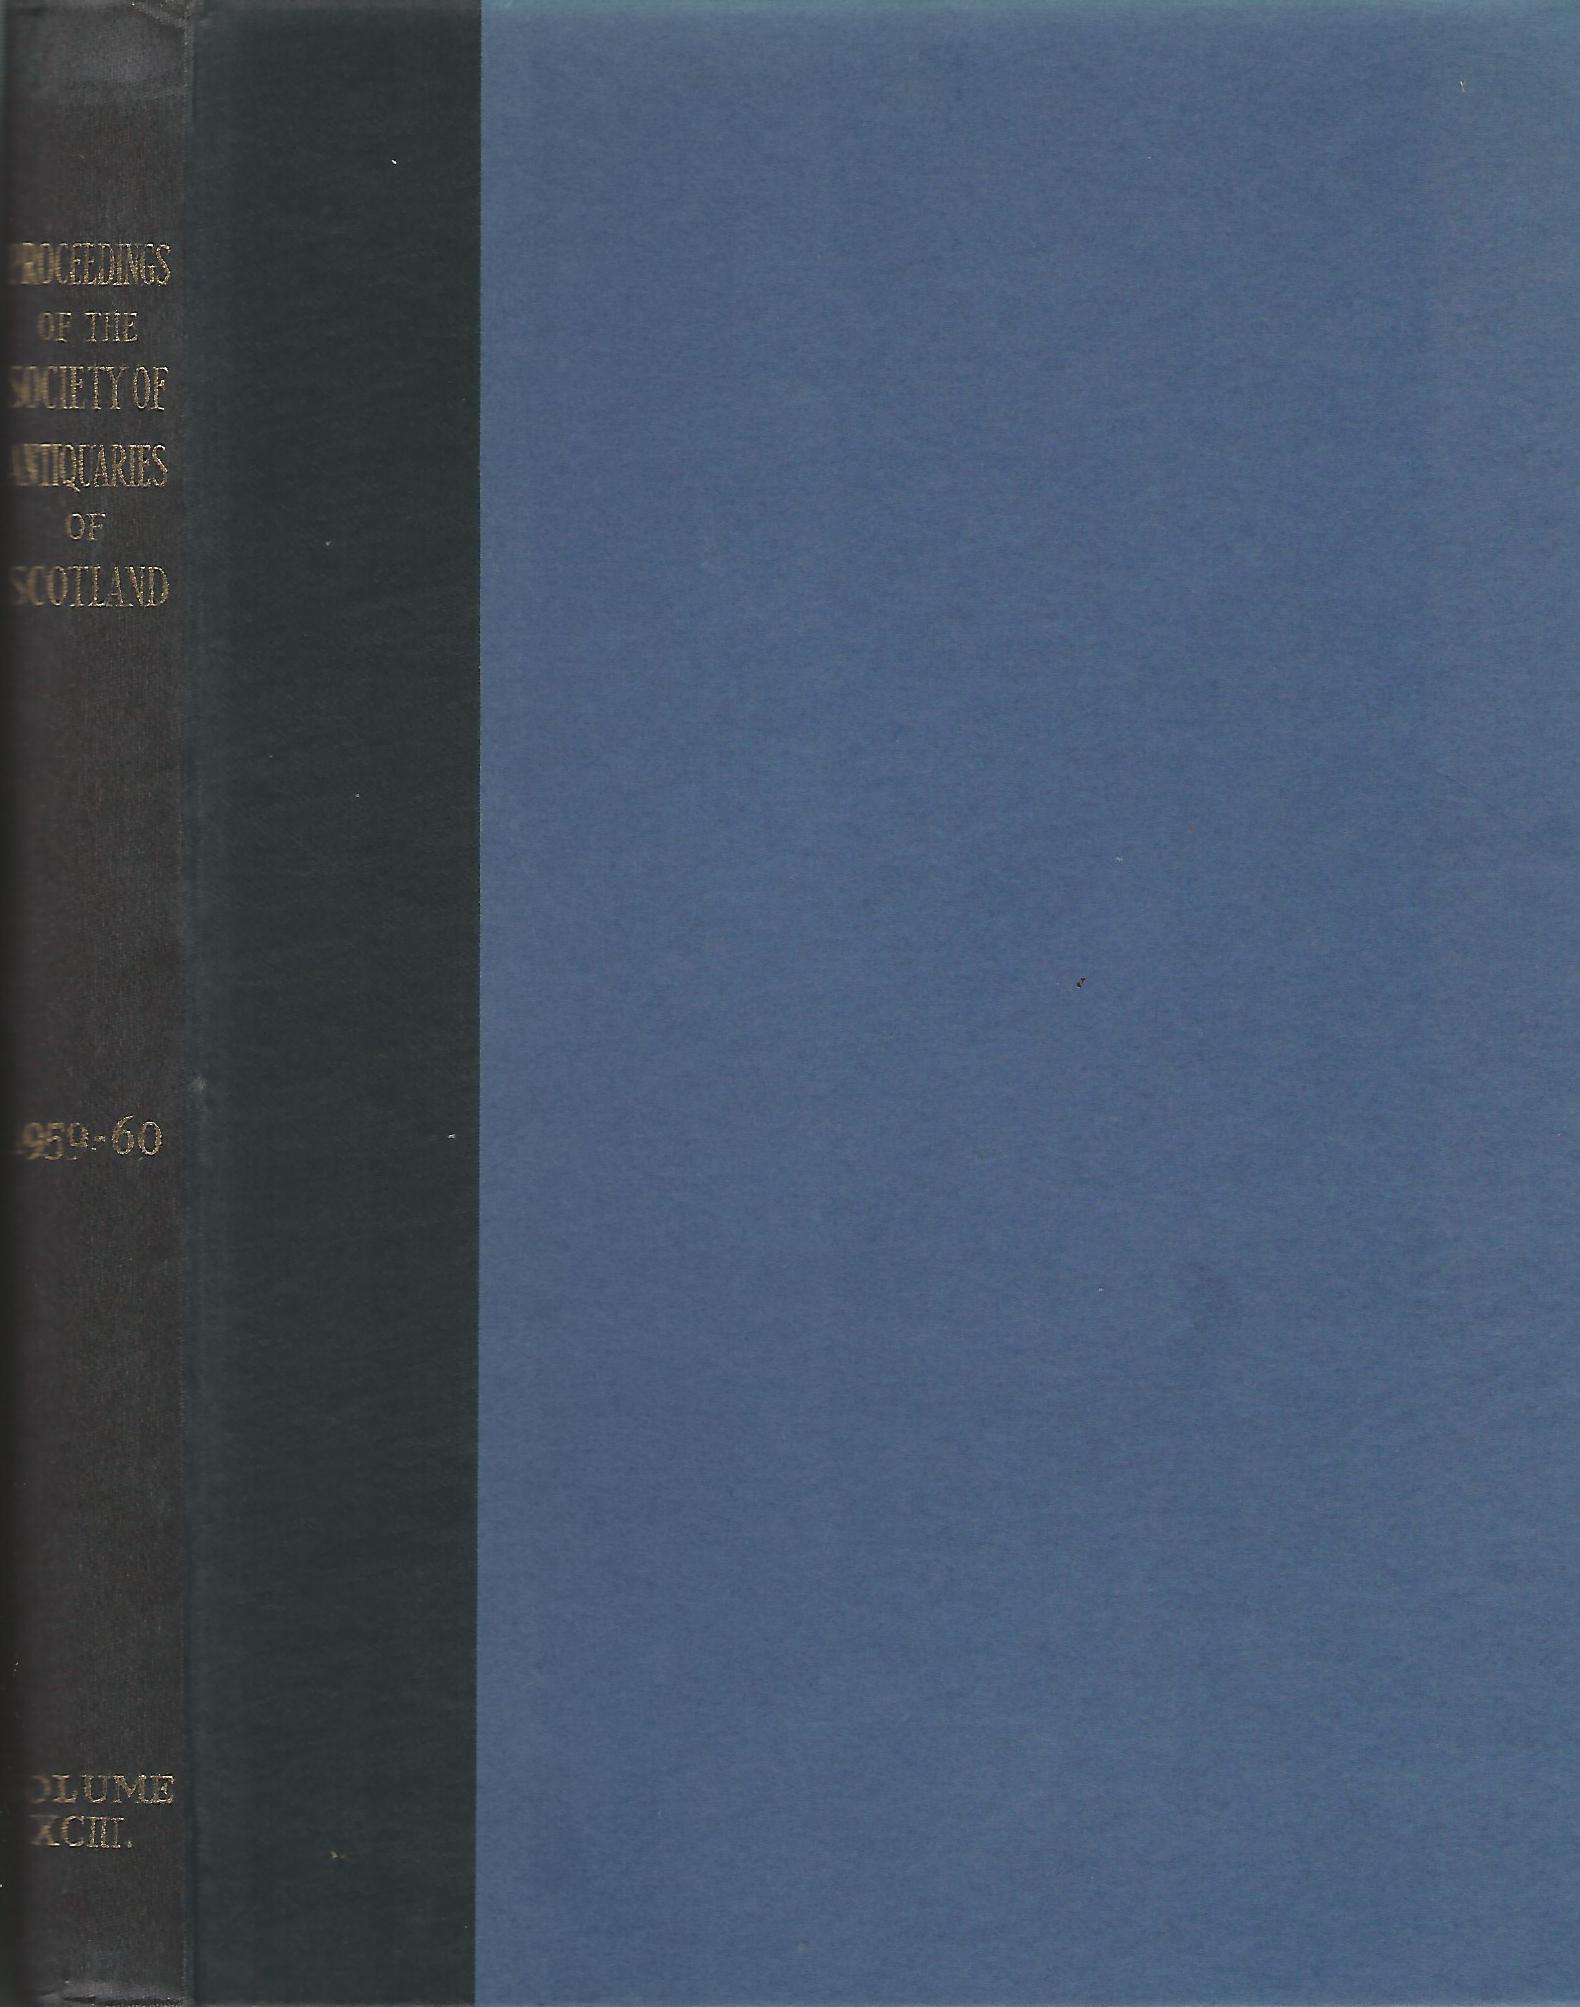 Proceedings of The Society of Antiquaries of Scotland Volume XCIII 1959-1960